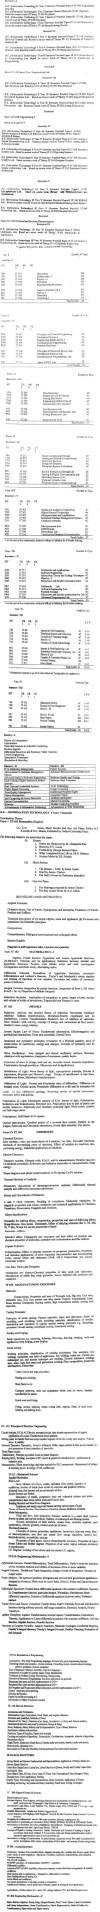 NSIT: Syllabus -Information Technology